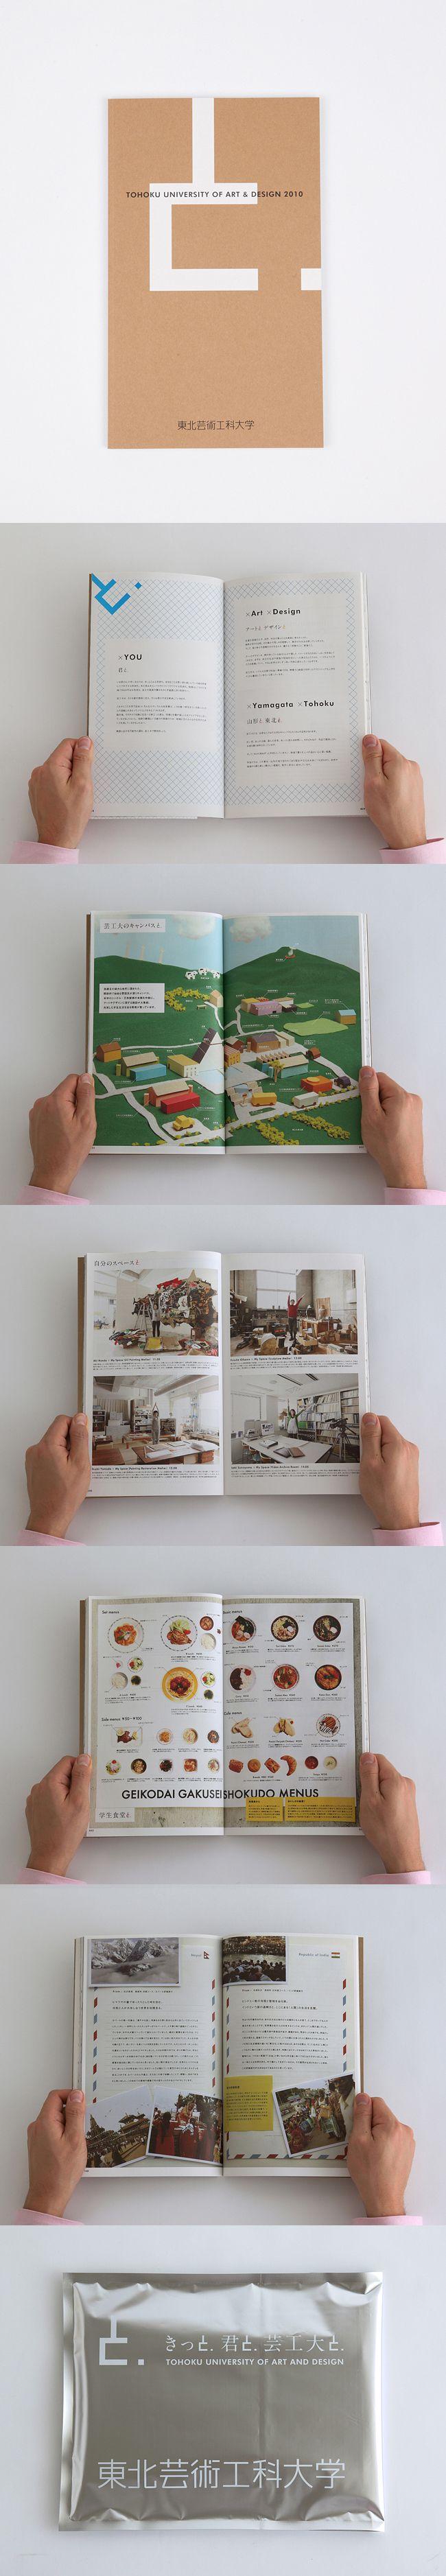 TOHOKU UNIVERSITY OF ART DESIGN 2010